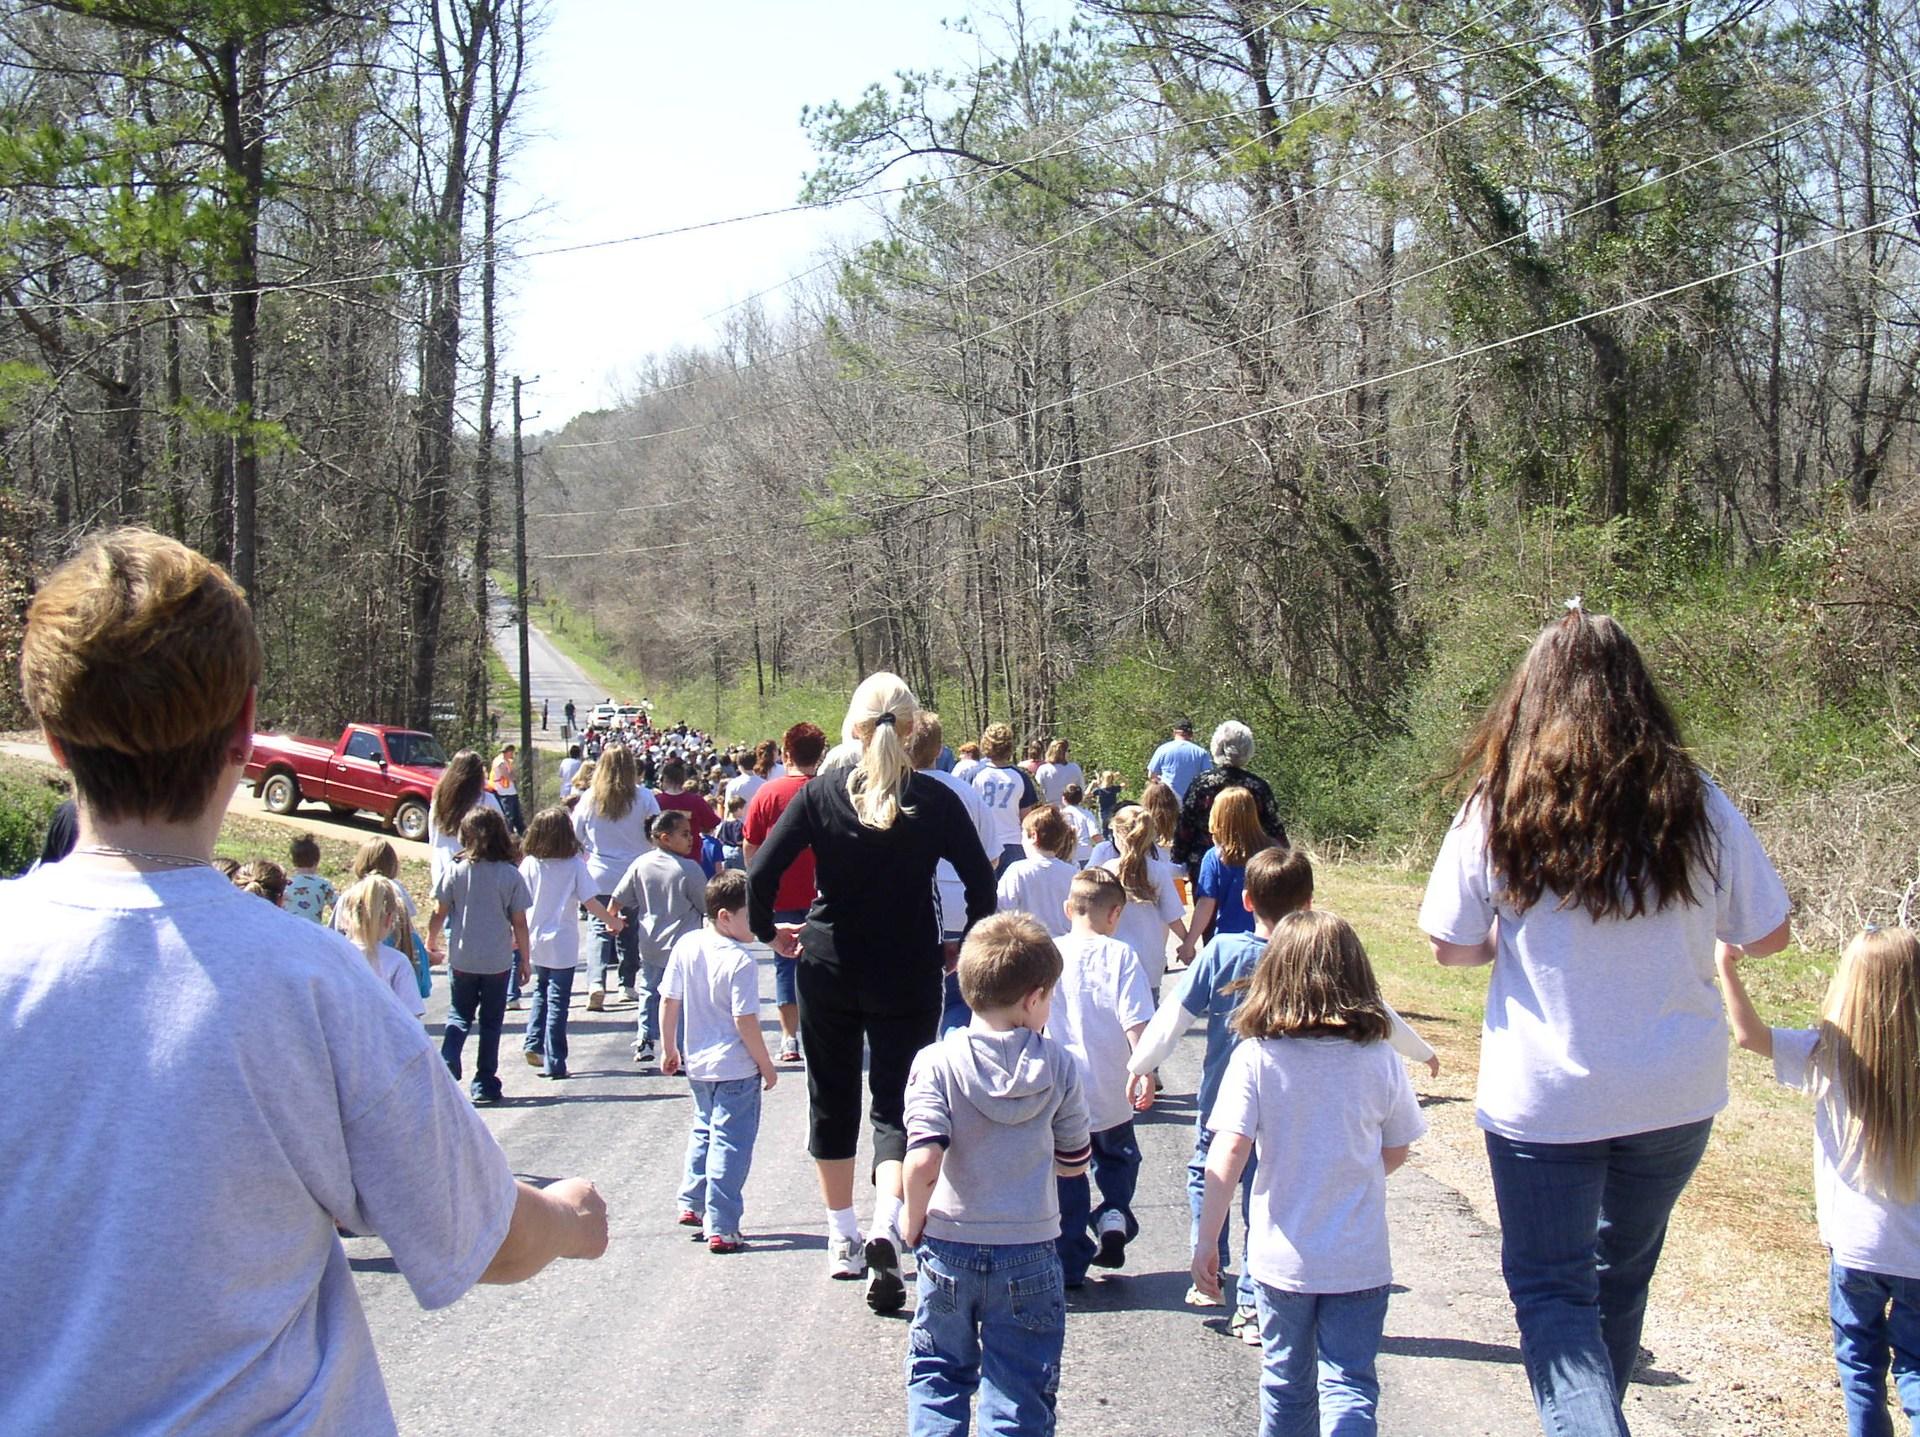 2017 Woodstock Elementary Wellness Walk action picture of walk